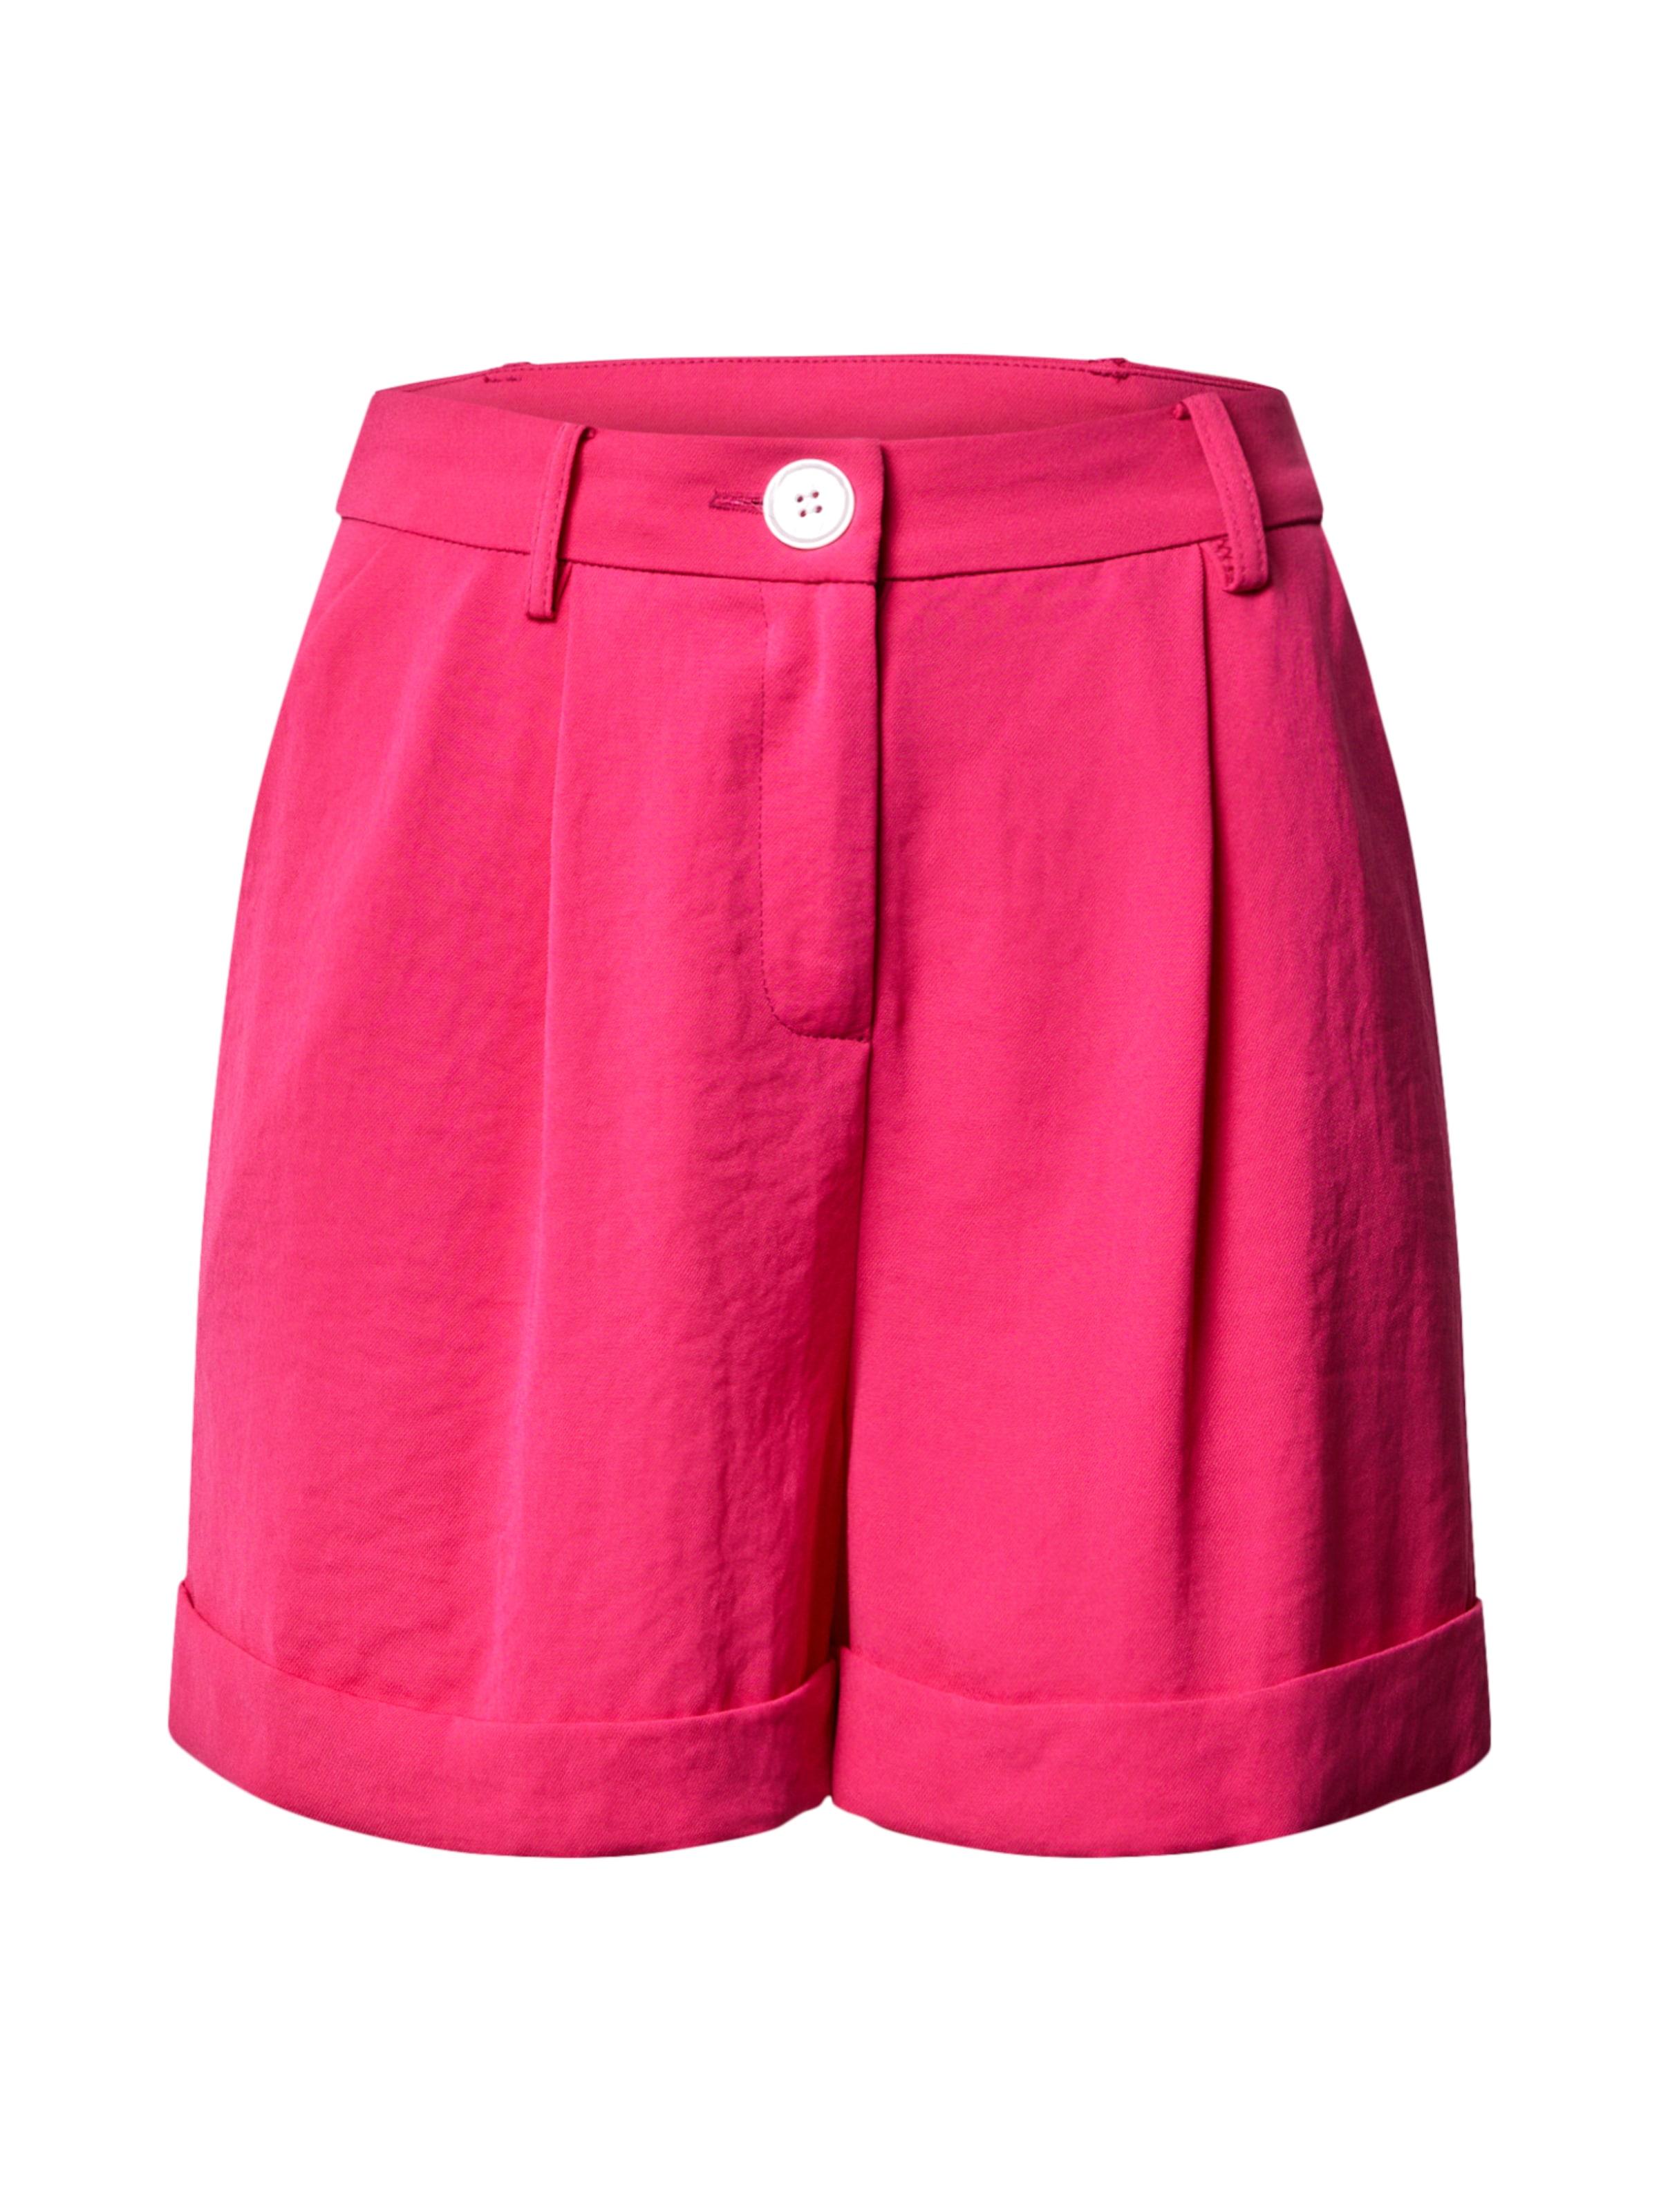 Miss Selfridge Shorts 'Hot Pink Button Short' in pink